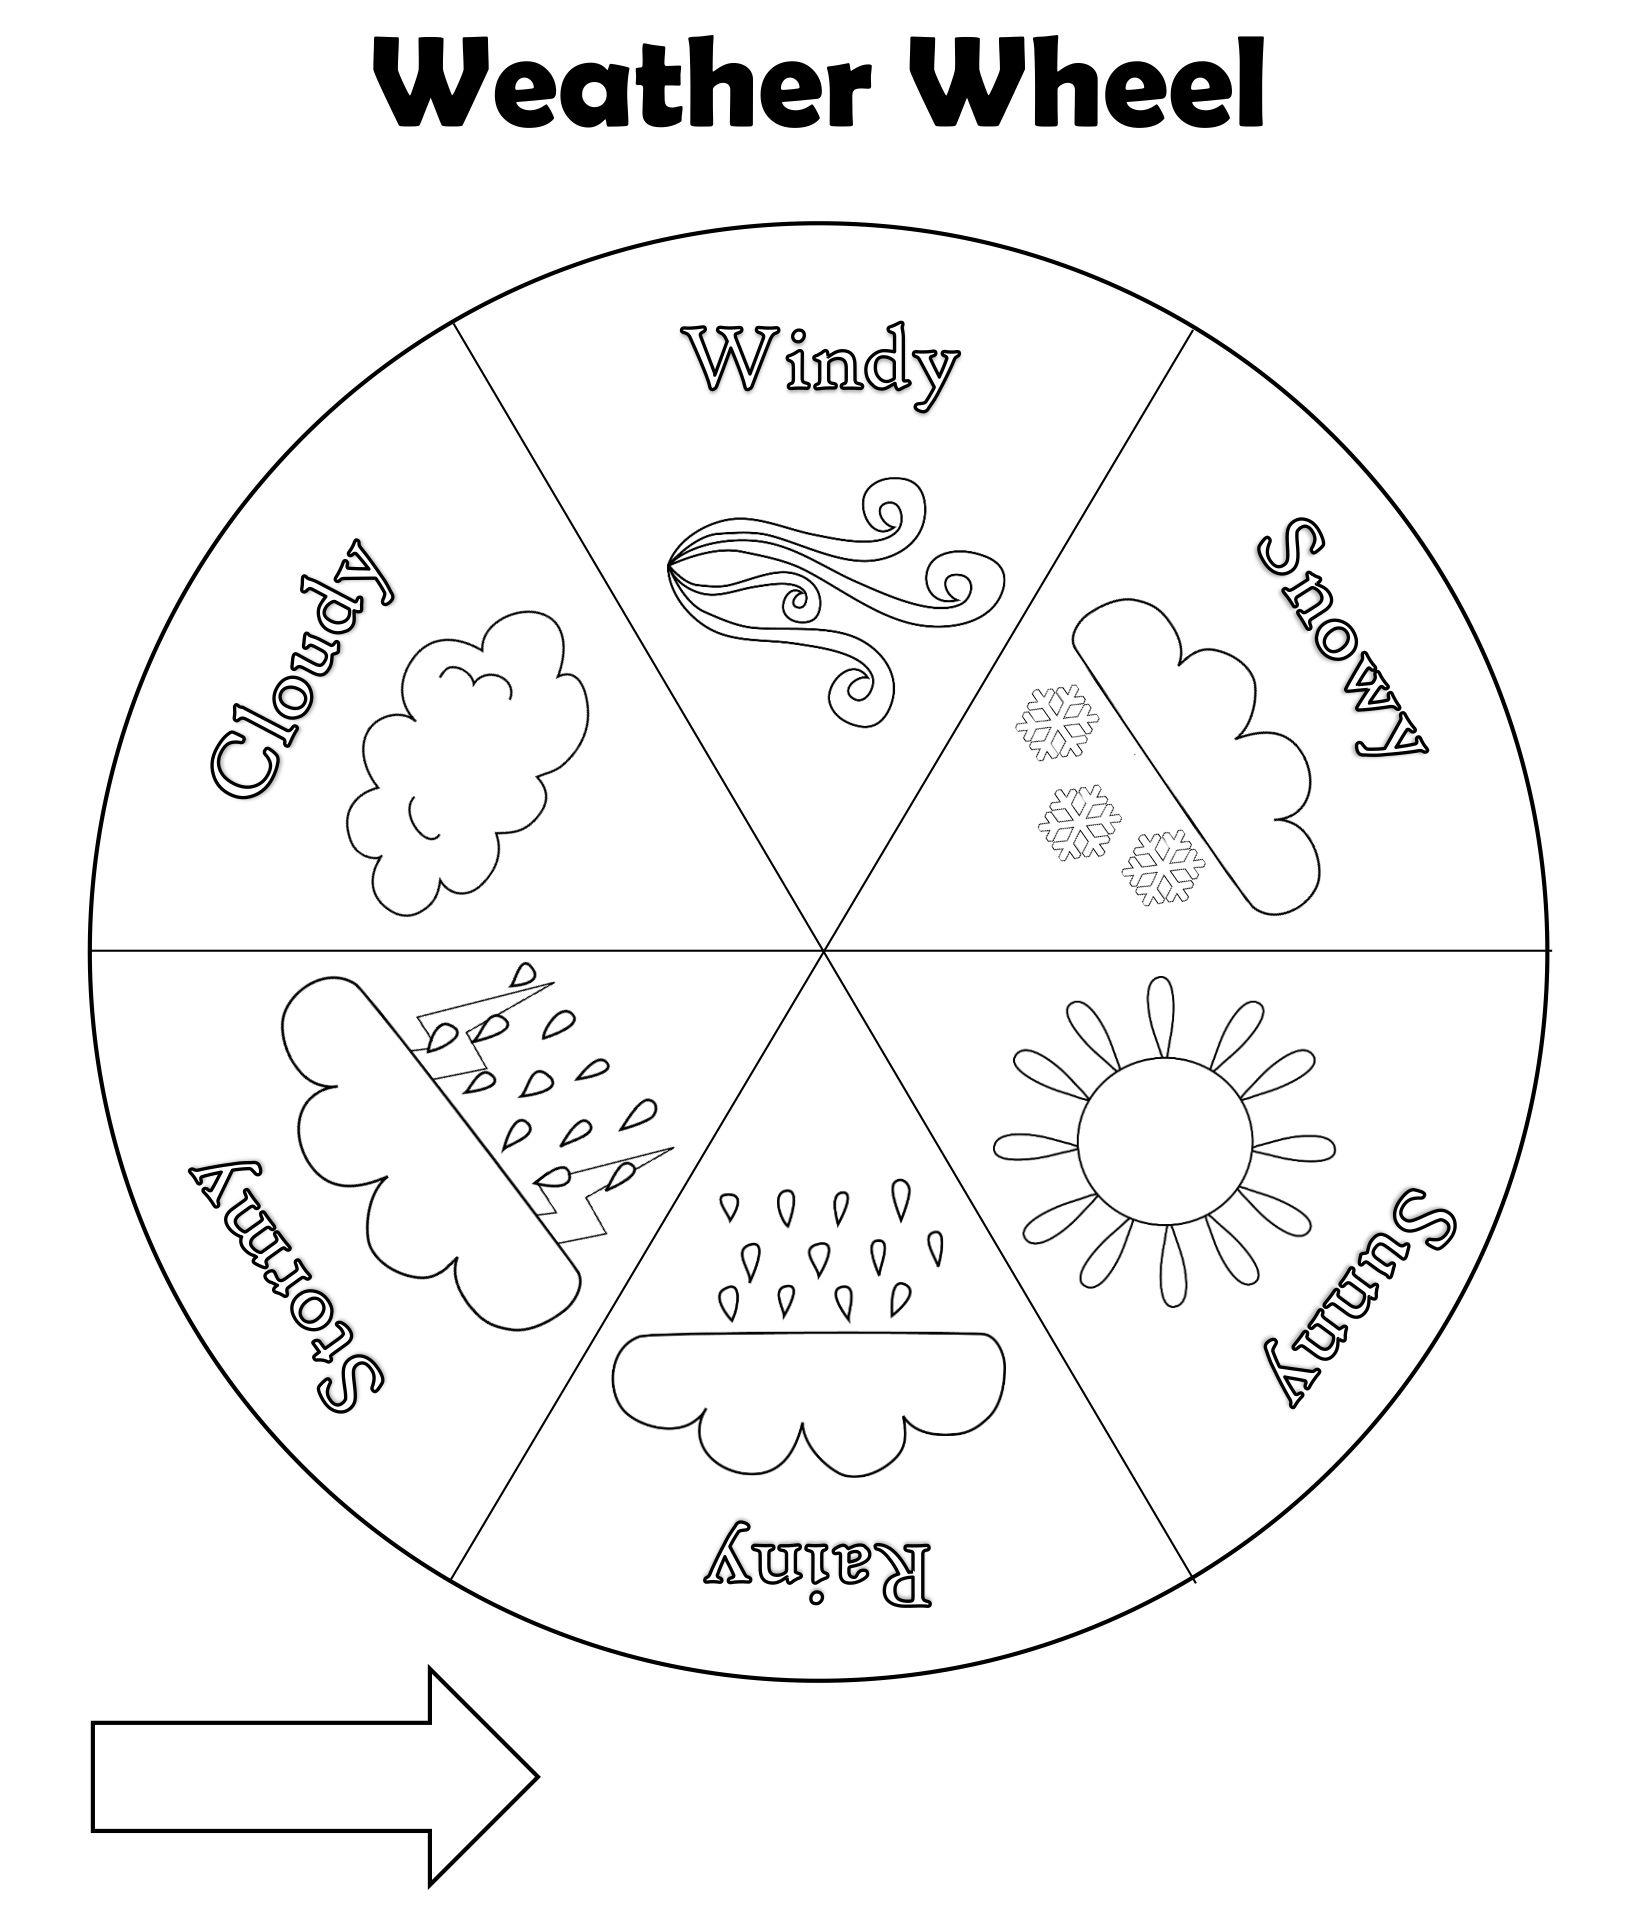 Preschool Weather Wheel Printable